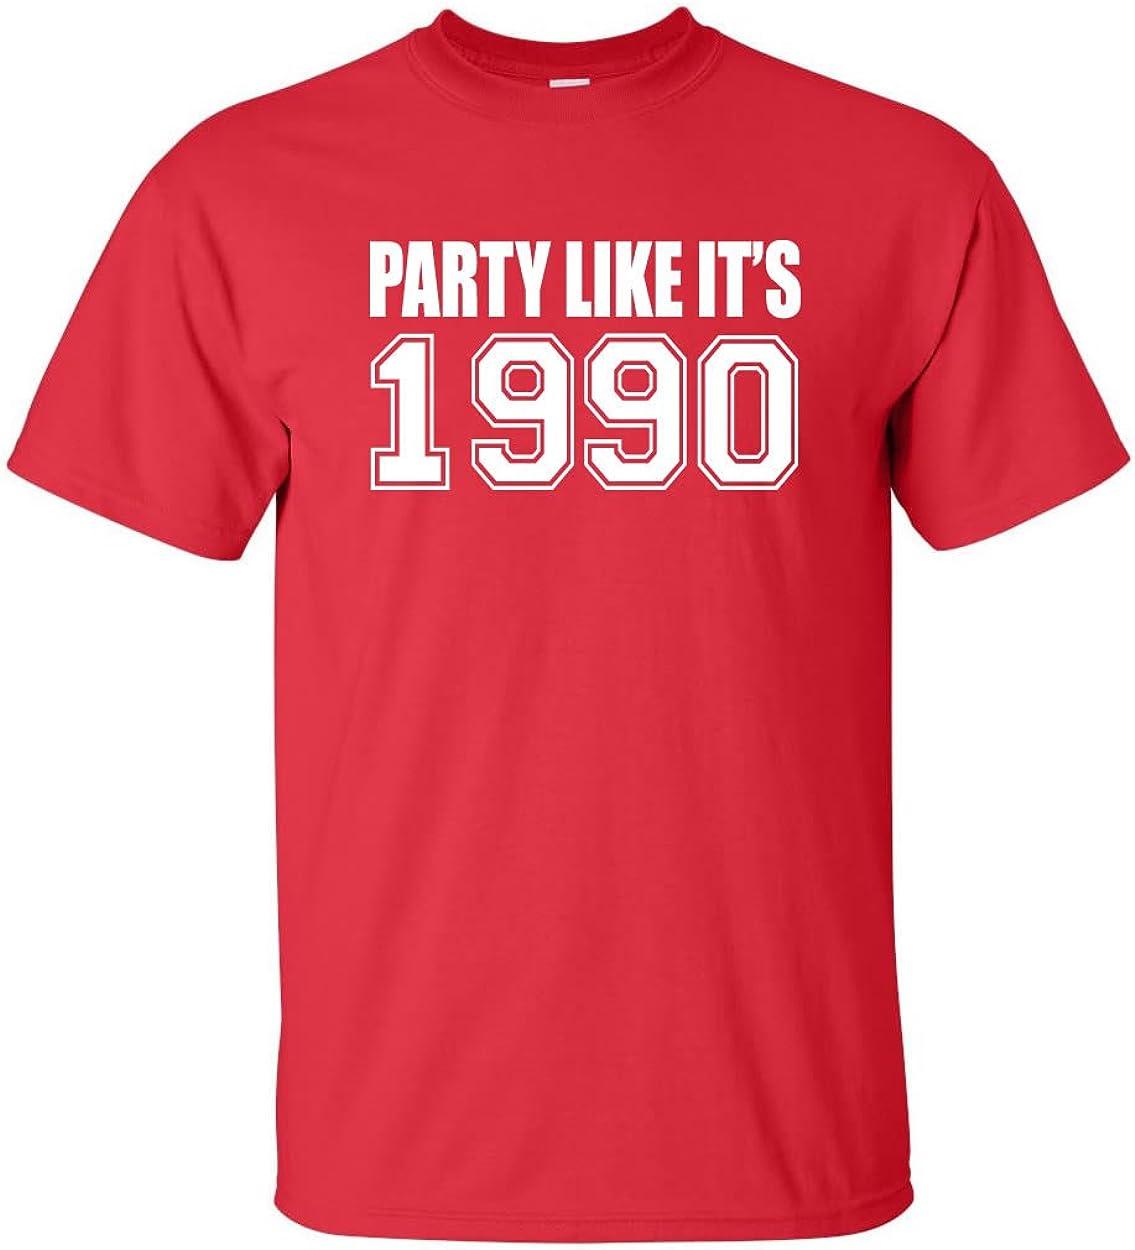 zerogravitee Party Like It's 1990 Adult Short Sleeve T-Shirt